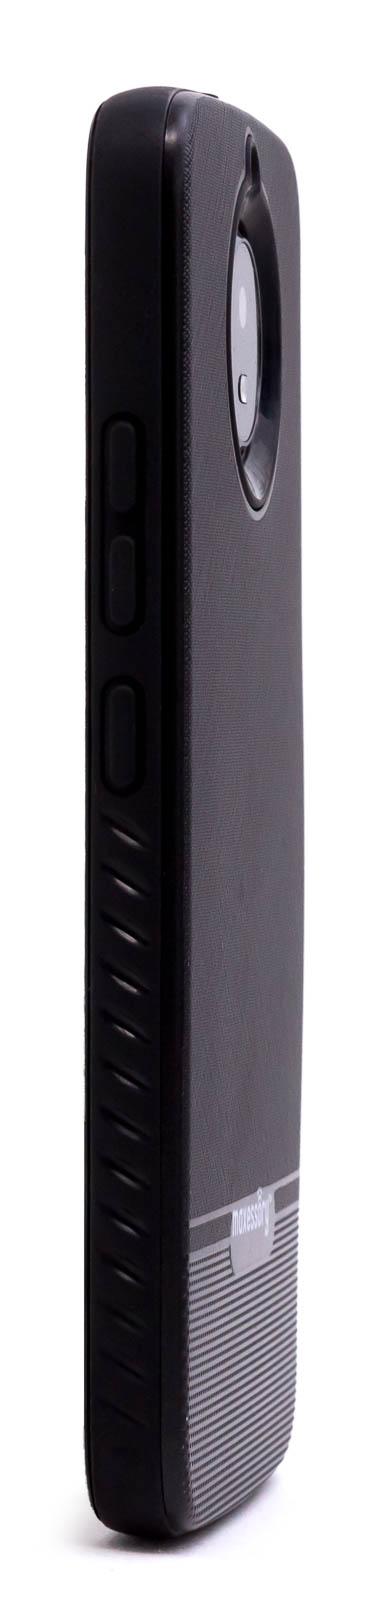 Moto-G5s-Case-Moto-G6-Case-Ultra-Thin-Hard-Body-Tactile-Shell-Cover thumbnail 4